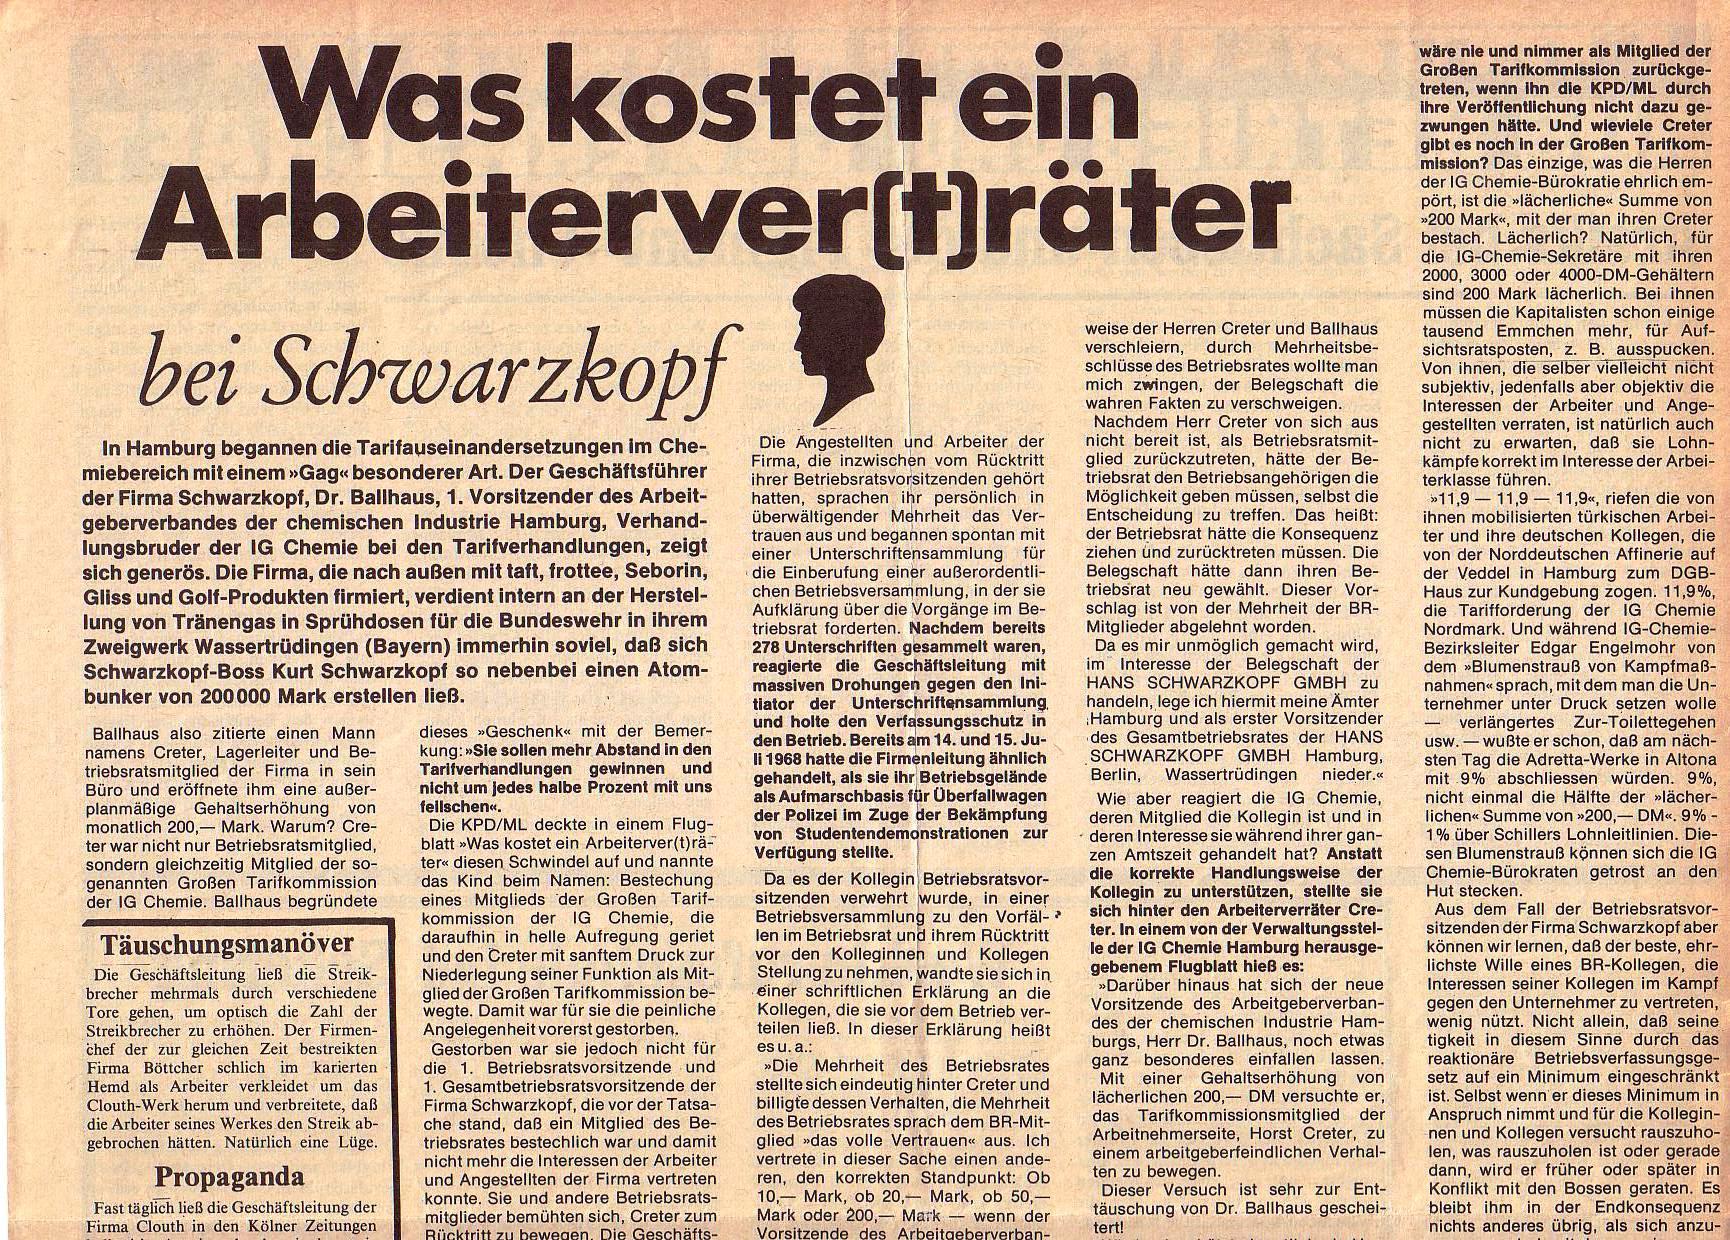 Roter Morgen, 5. Jg., Juli 1971, Nr. 7, Seite 3a